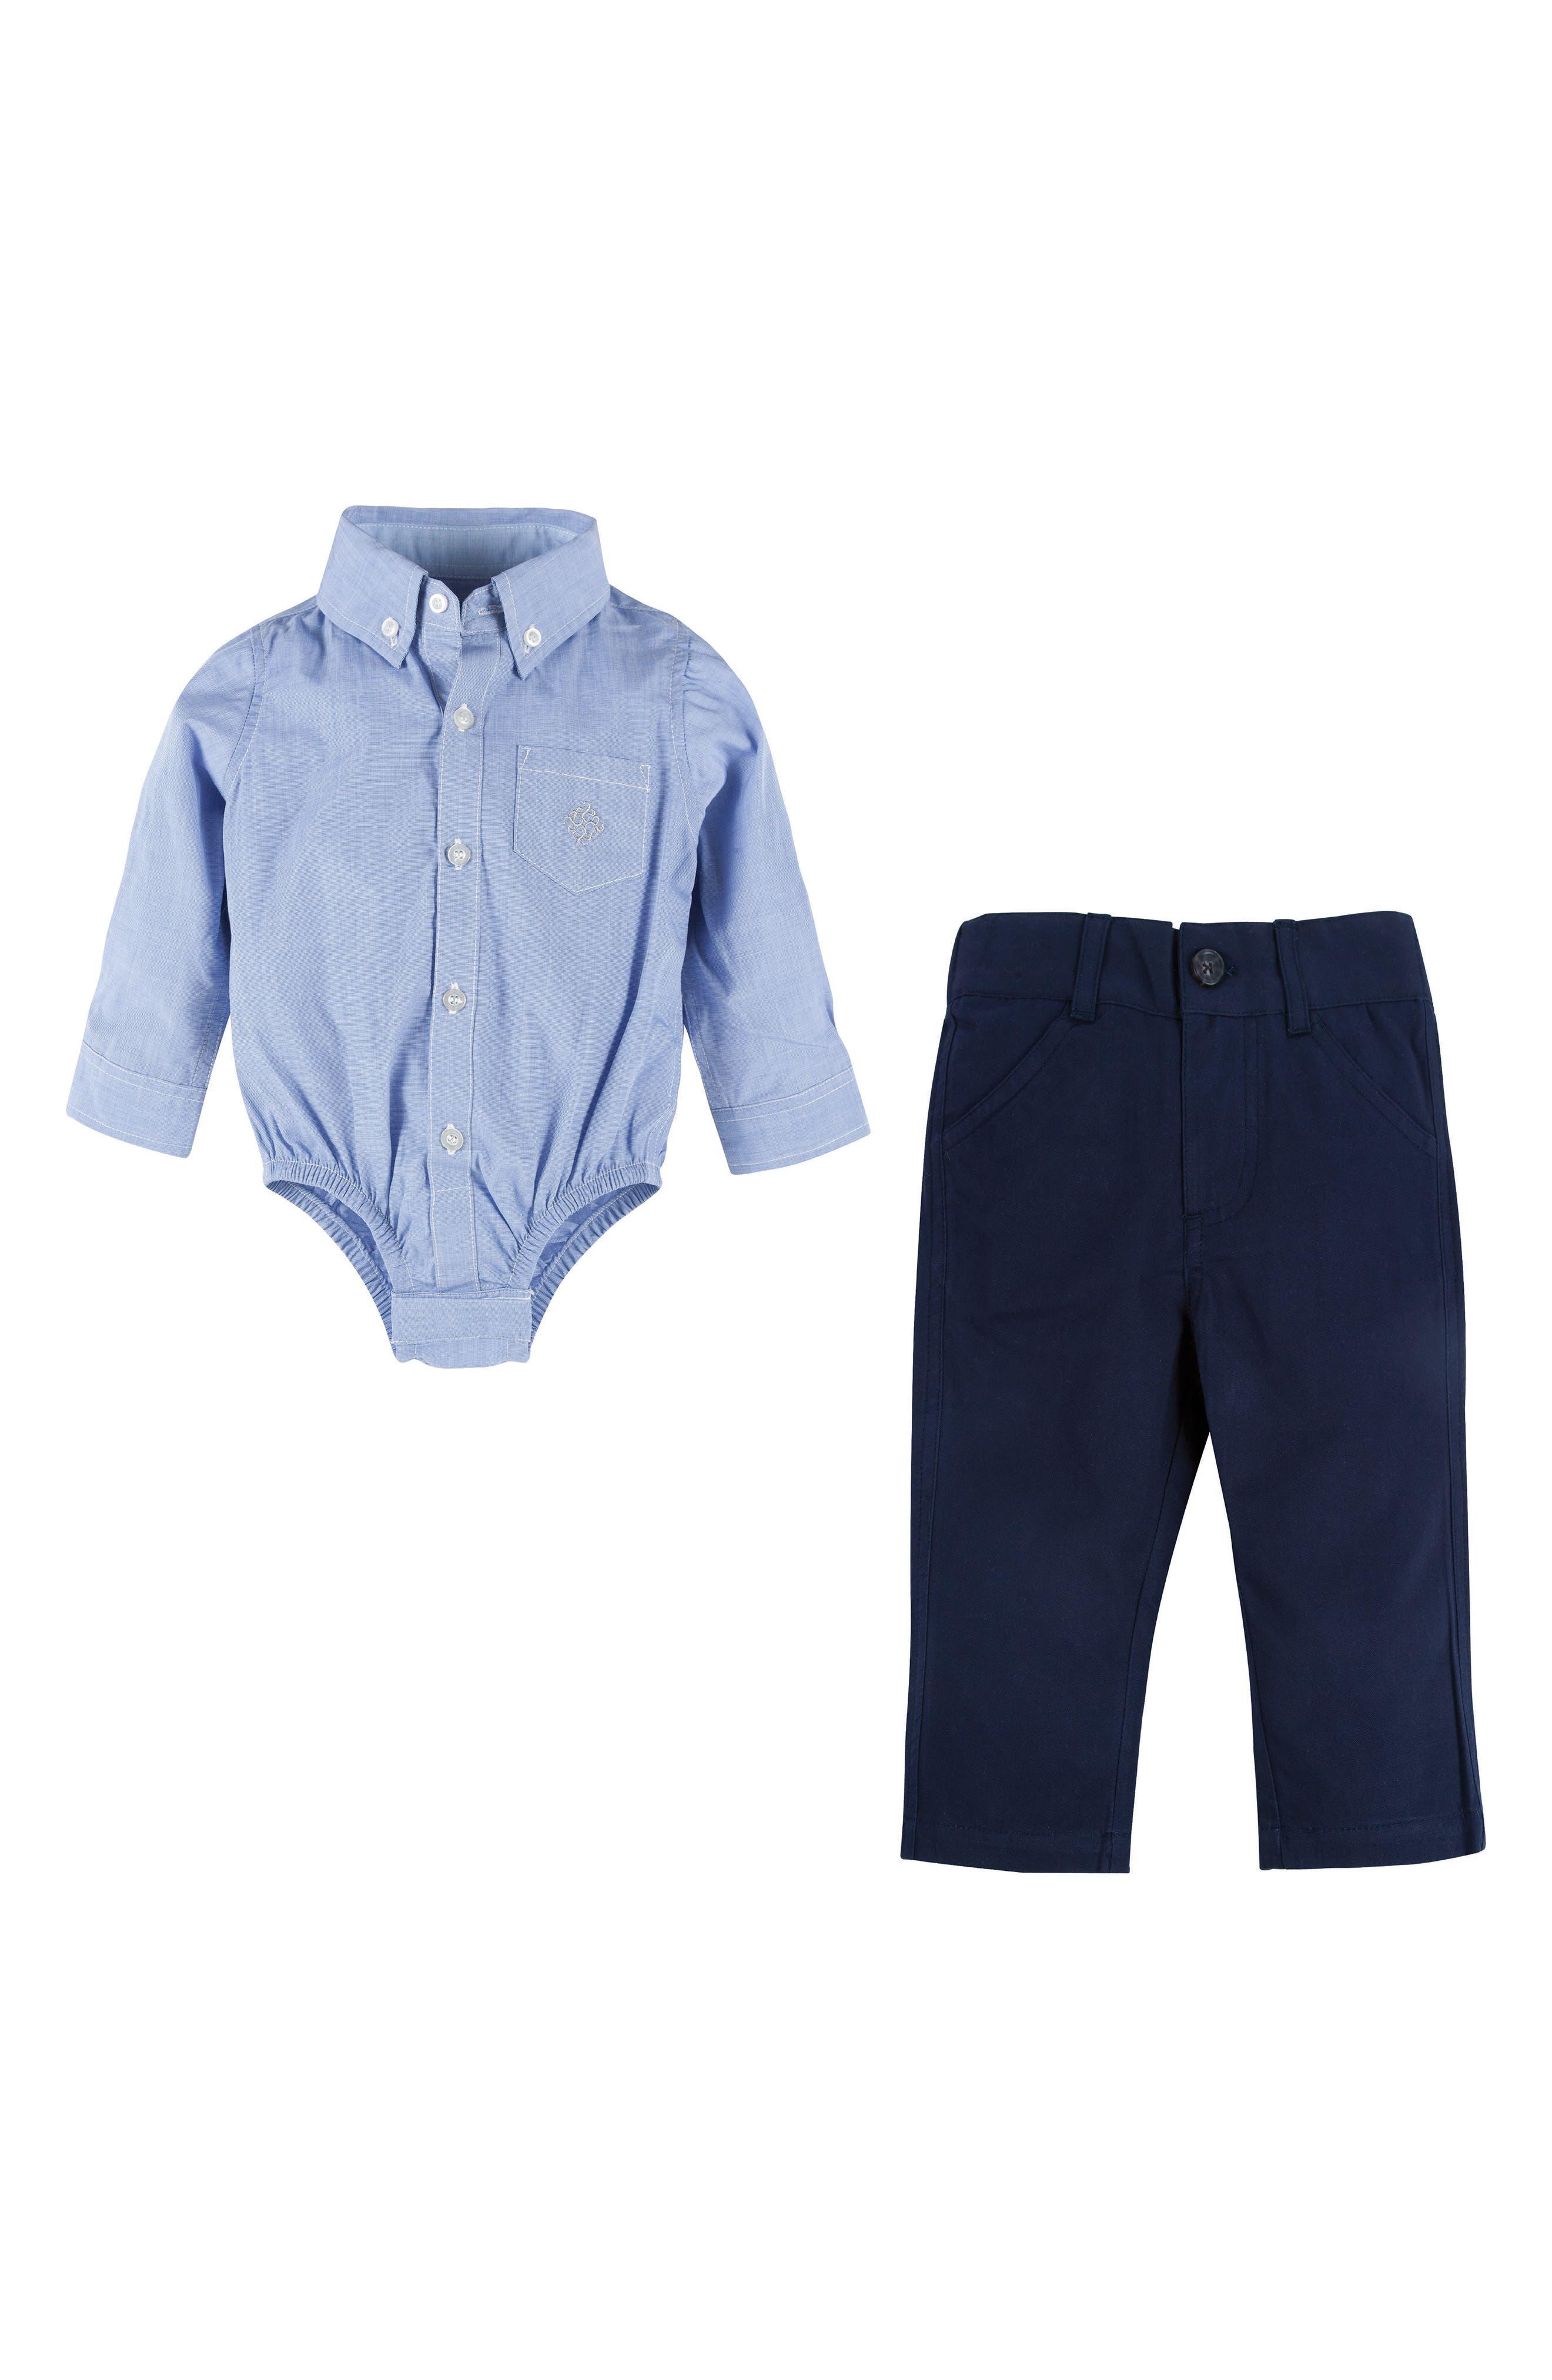 Main Image - Andy & Evan Shirtzie Chambray Bodysuit & Pants Set (Baby Boys)